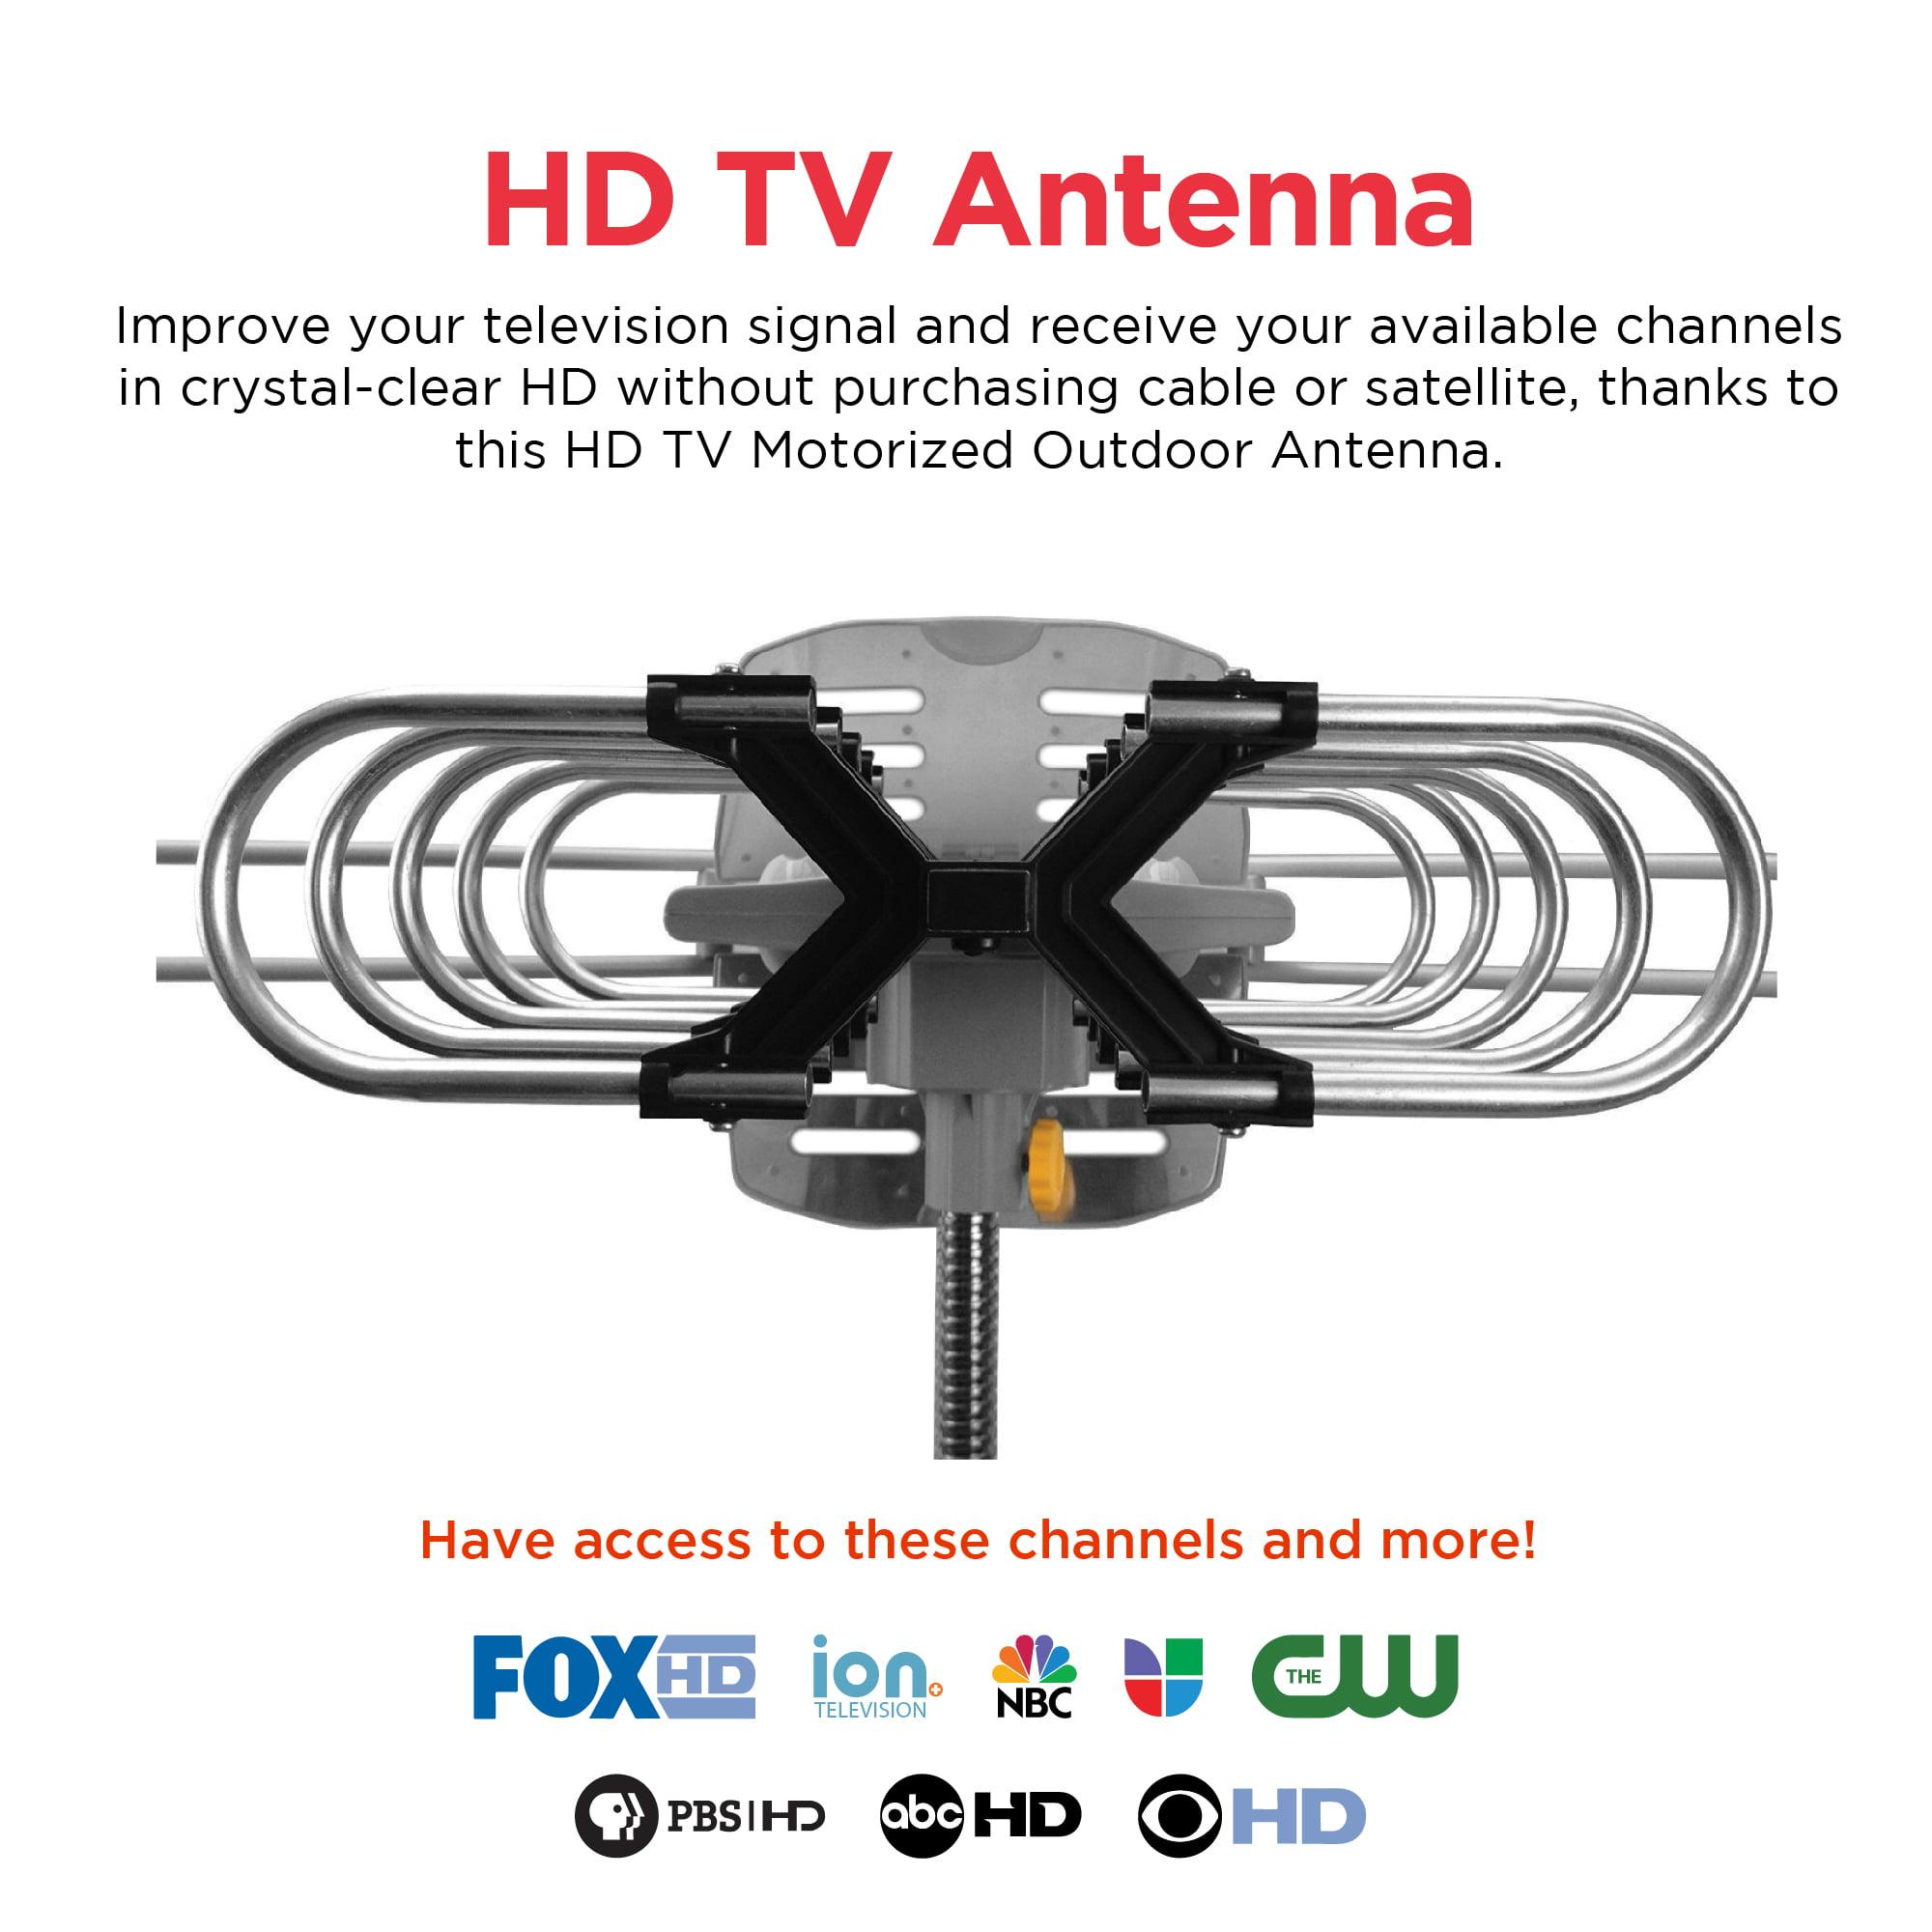 ematic hd tv motorized outdoor antenna with 150-mile range,refurbished -  walmart com